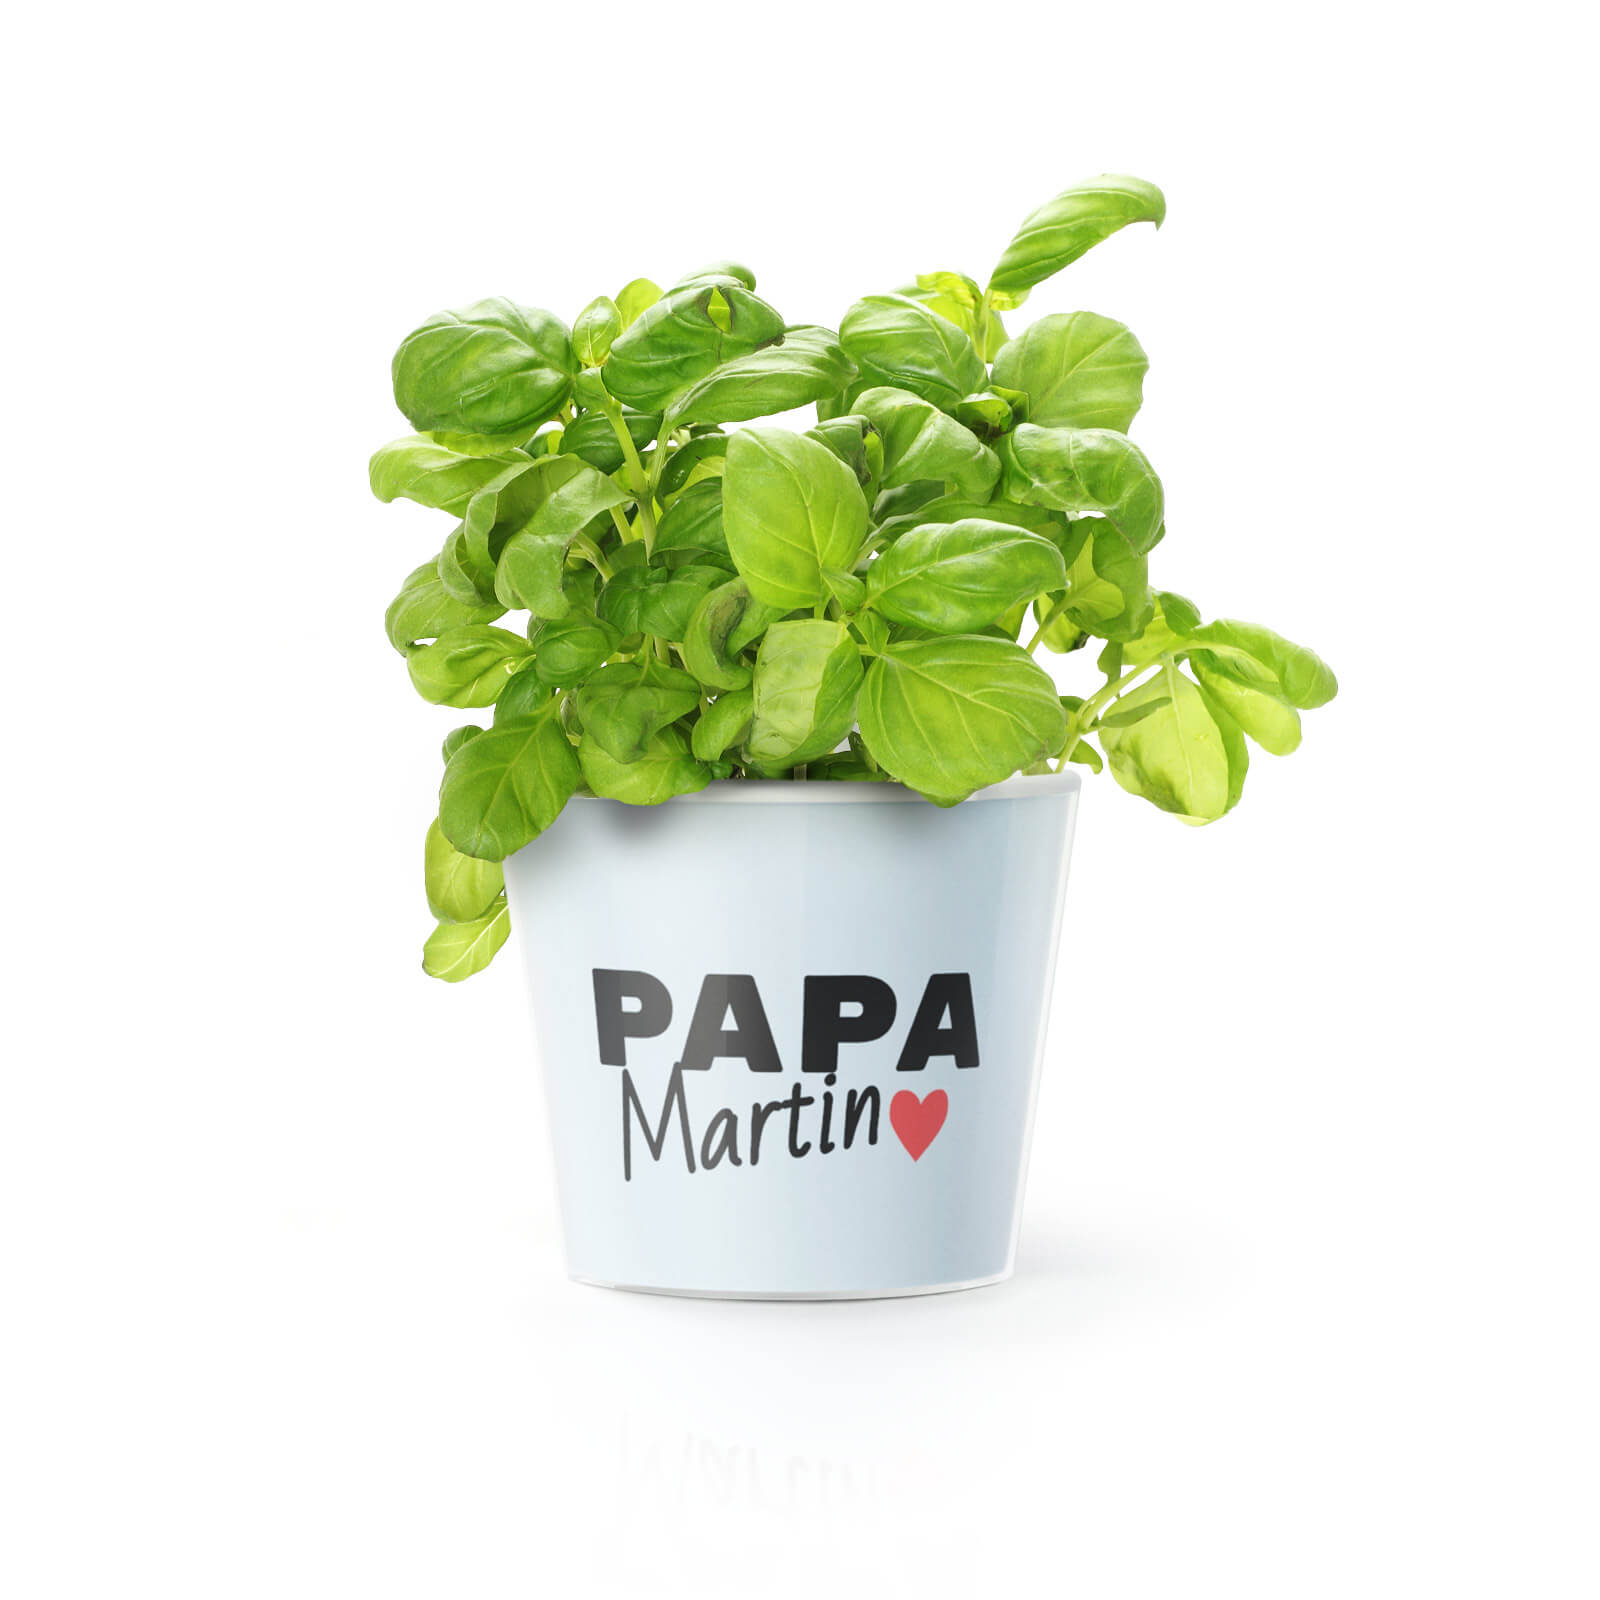 papa topf mit name. Black Bedroom Furniture Sets. Home Design Ideas